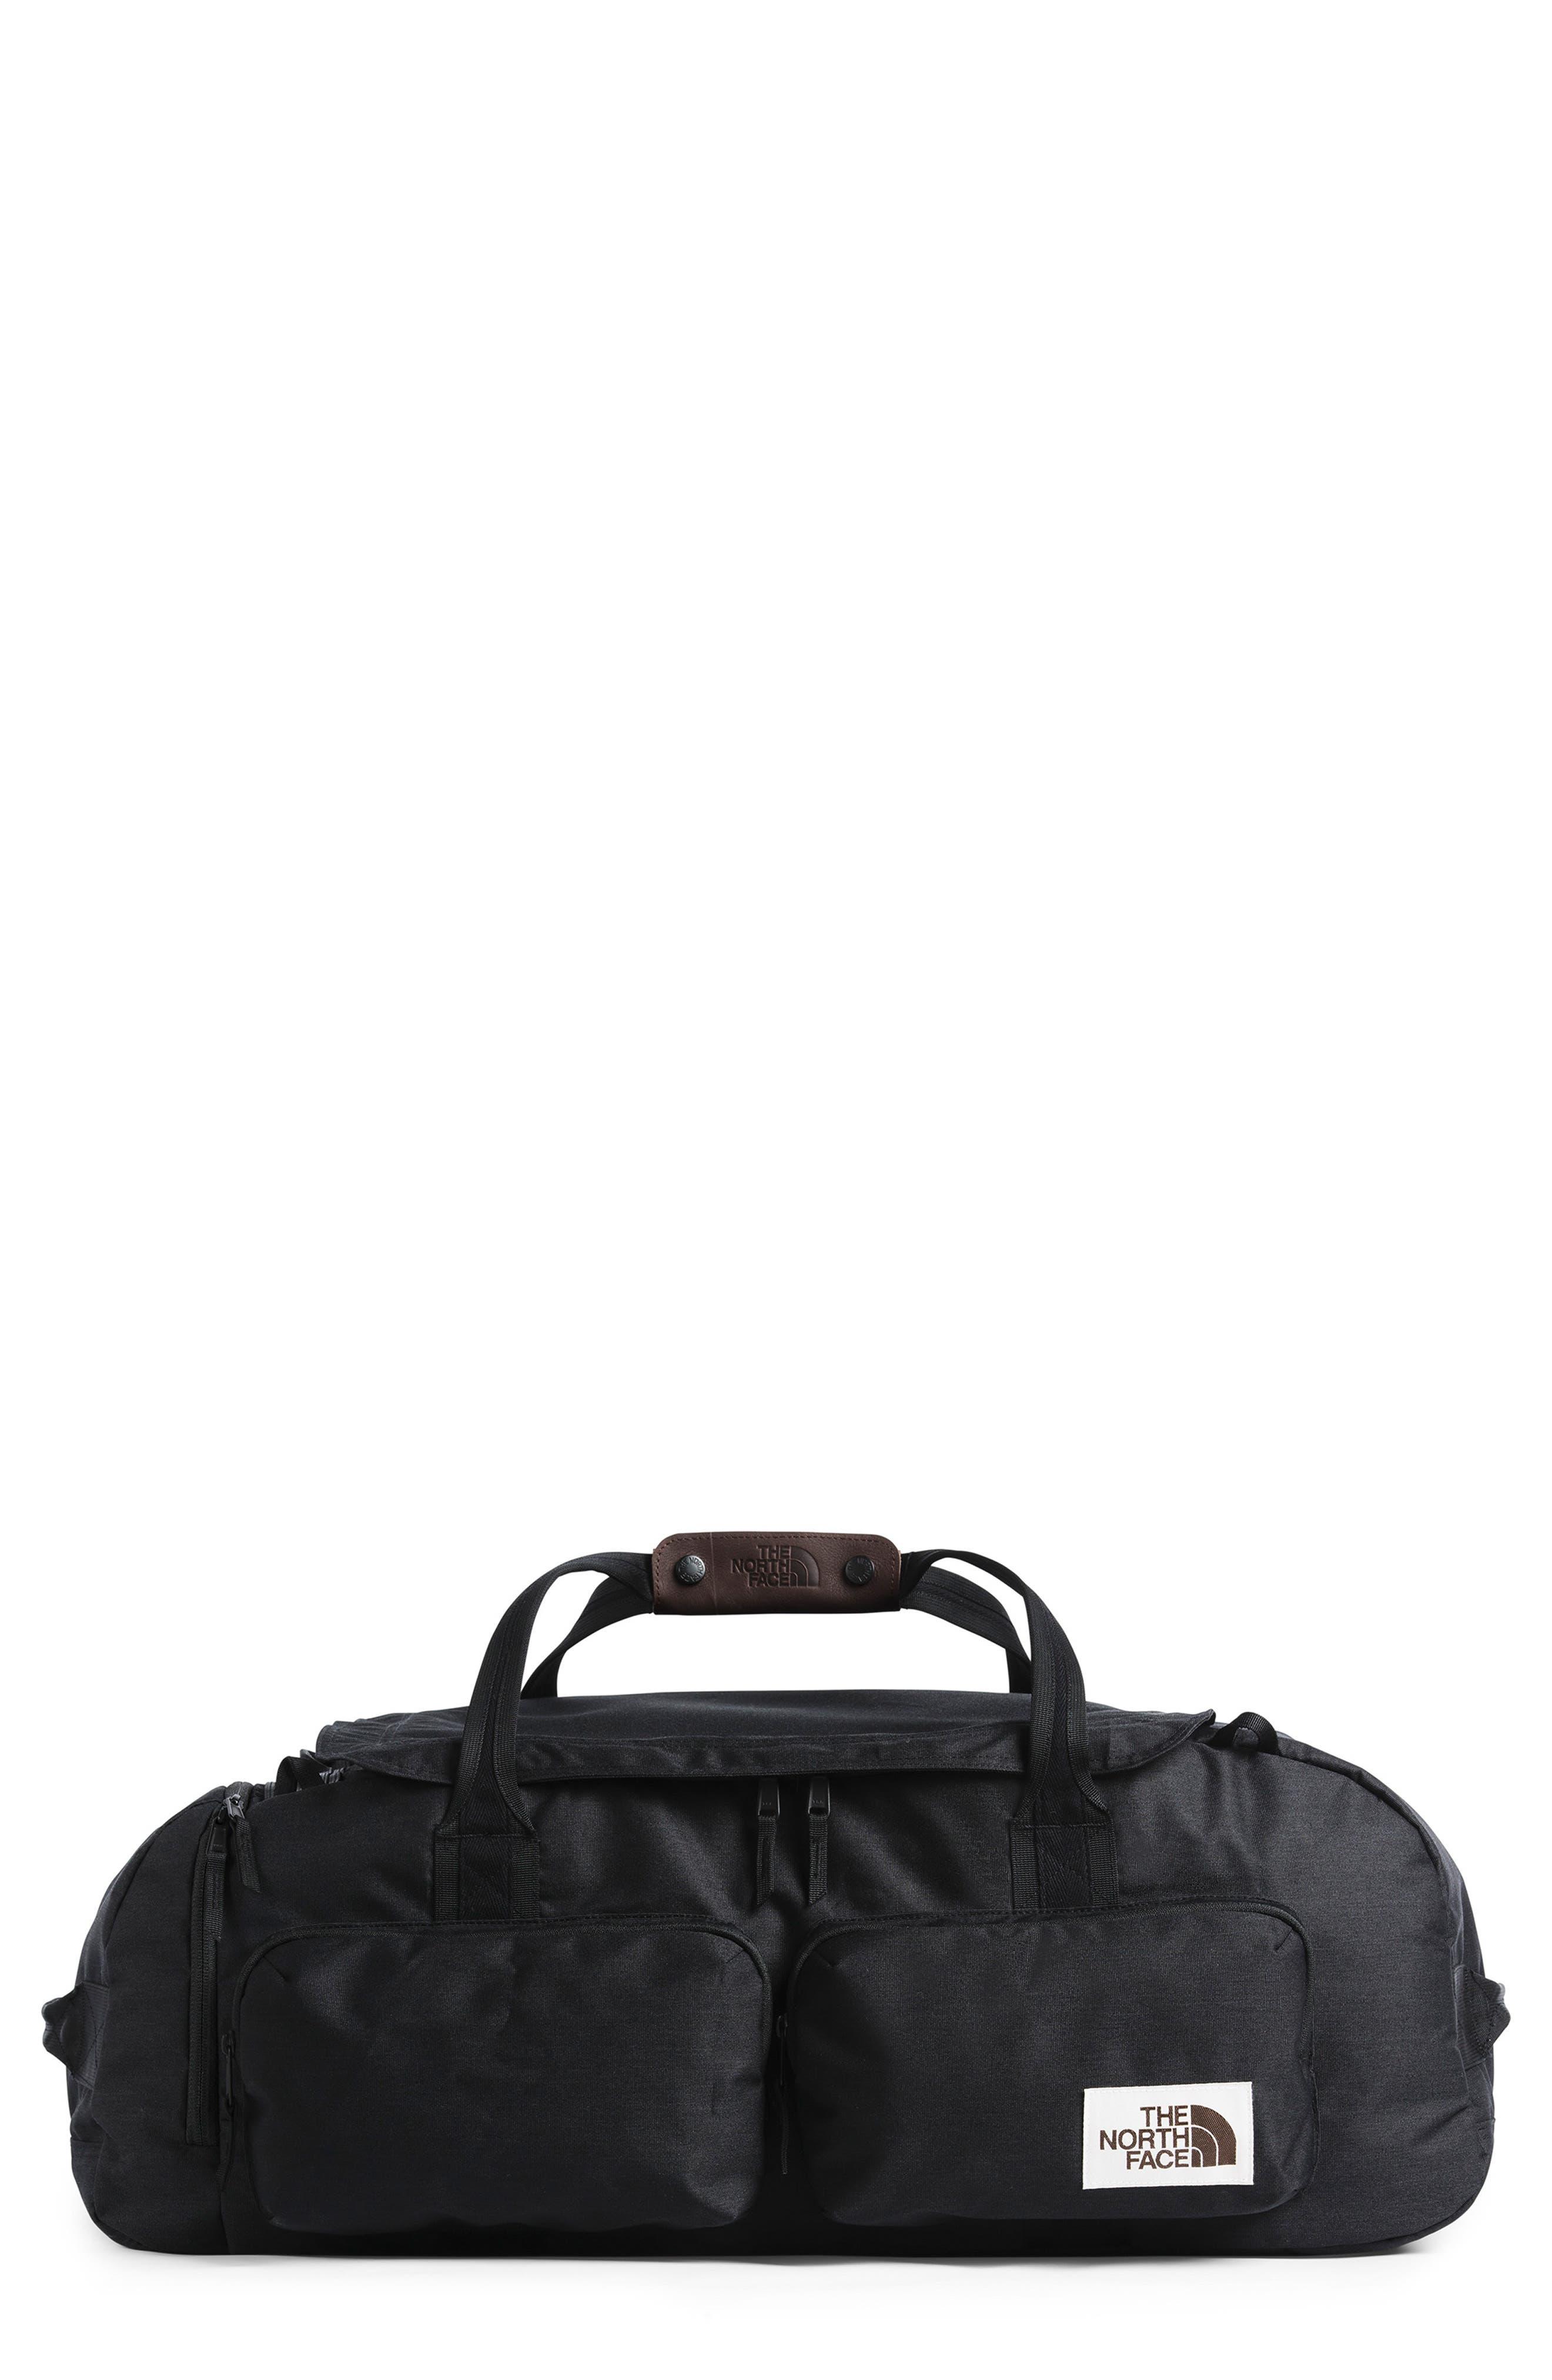 THE NORTH FACE, Berkeley Duffle Bag, Main thumbnail 1, color, BLACK HEATHER